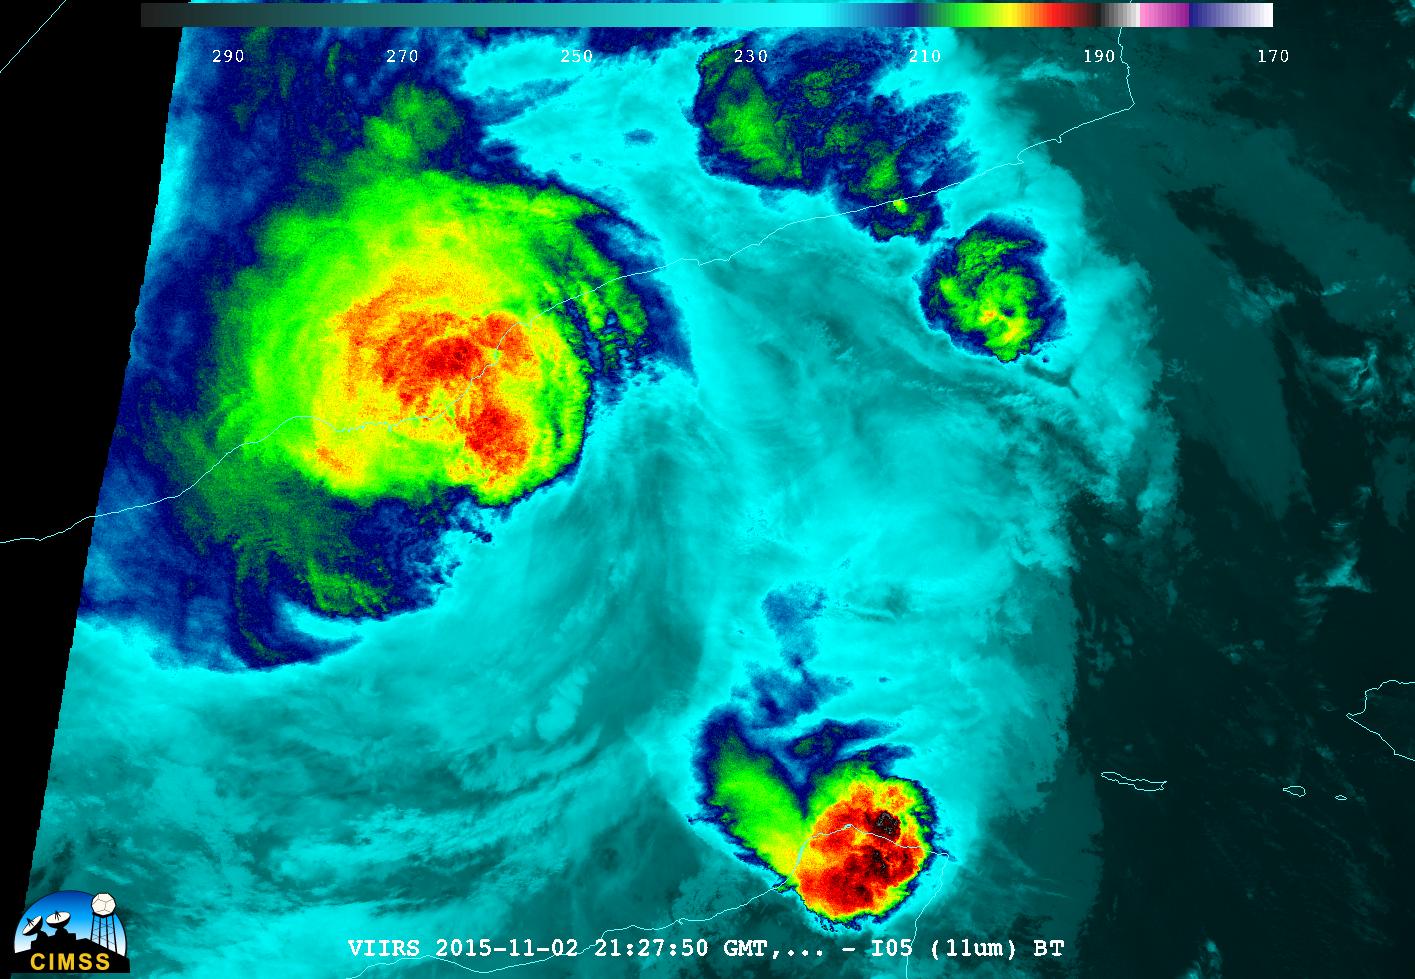 Suomi NPP VIIRS I05 (11.45 µm) Infrared Image, 2127 UTC on 2 November [click to enlarge]